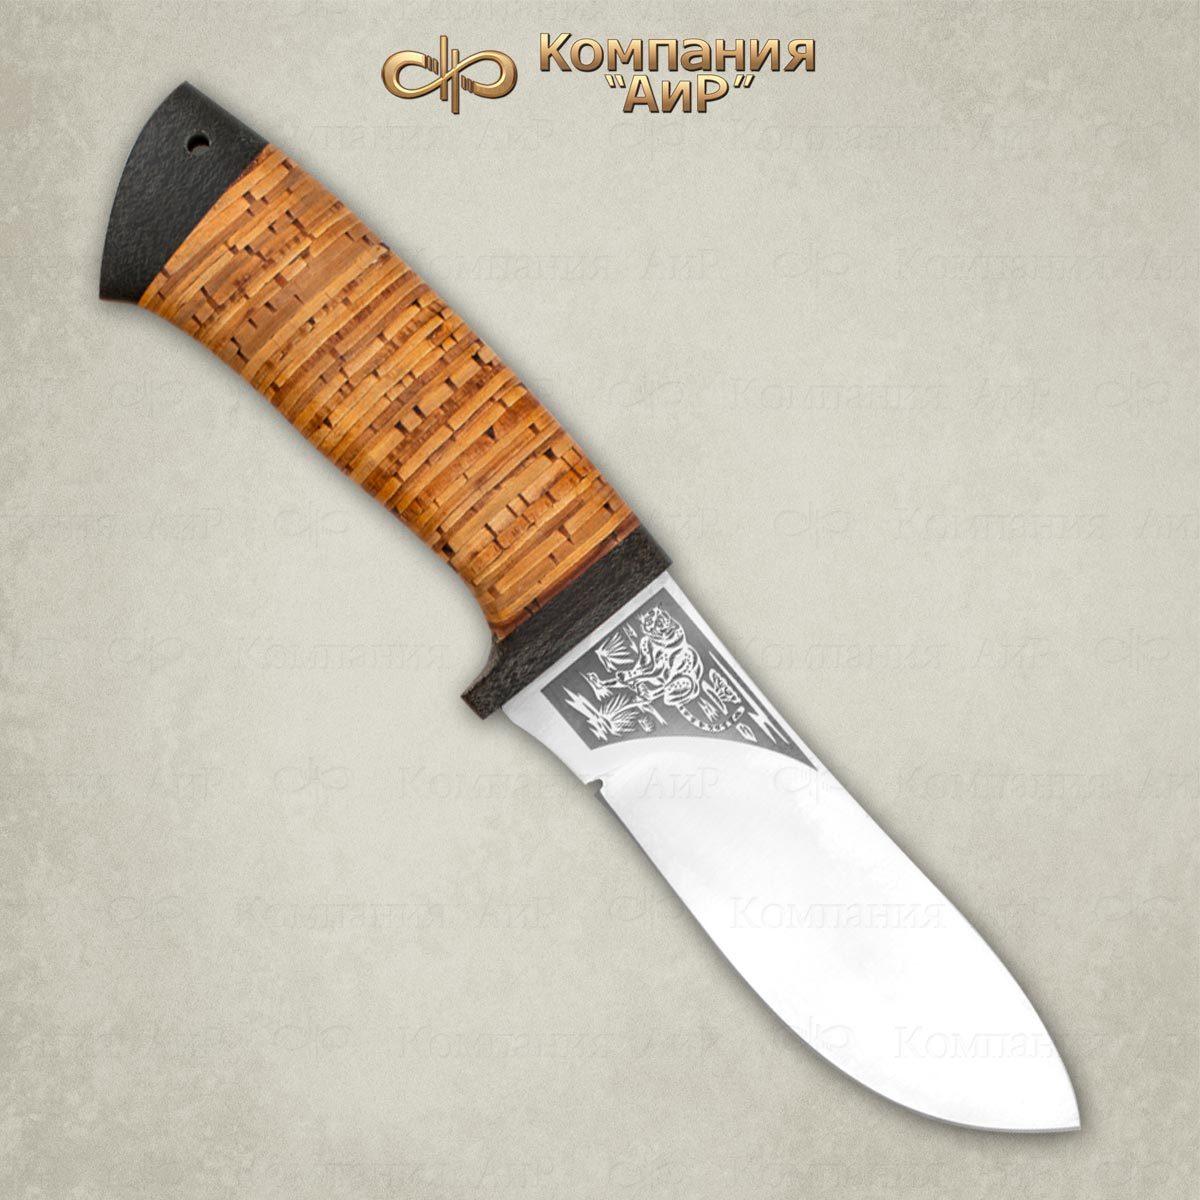 Нож разделочный Гепард, рукоять береста, АиР